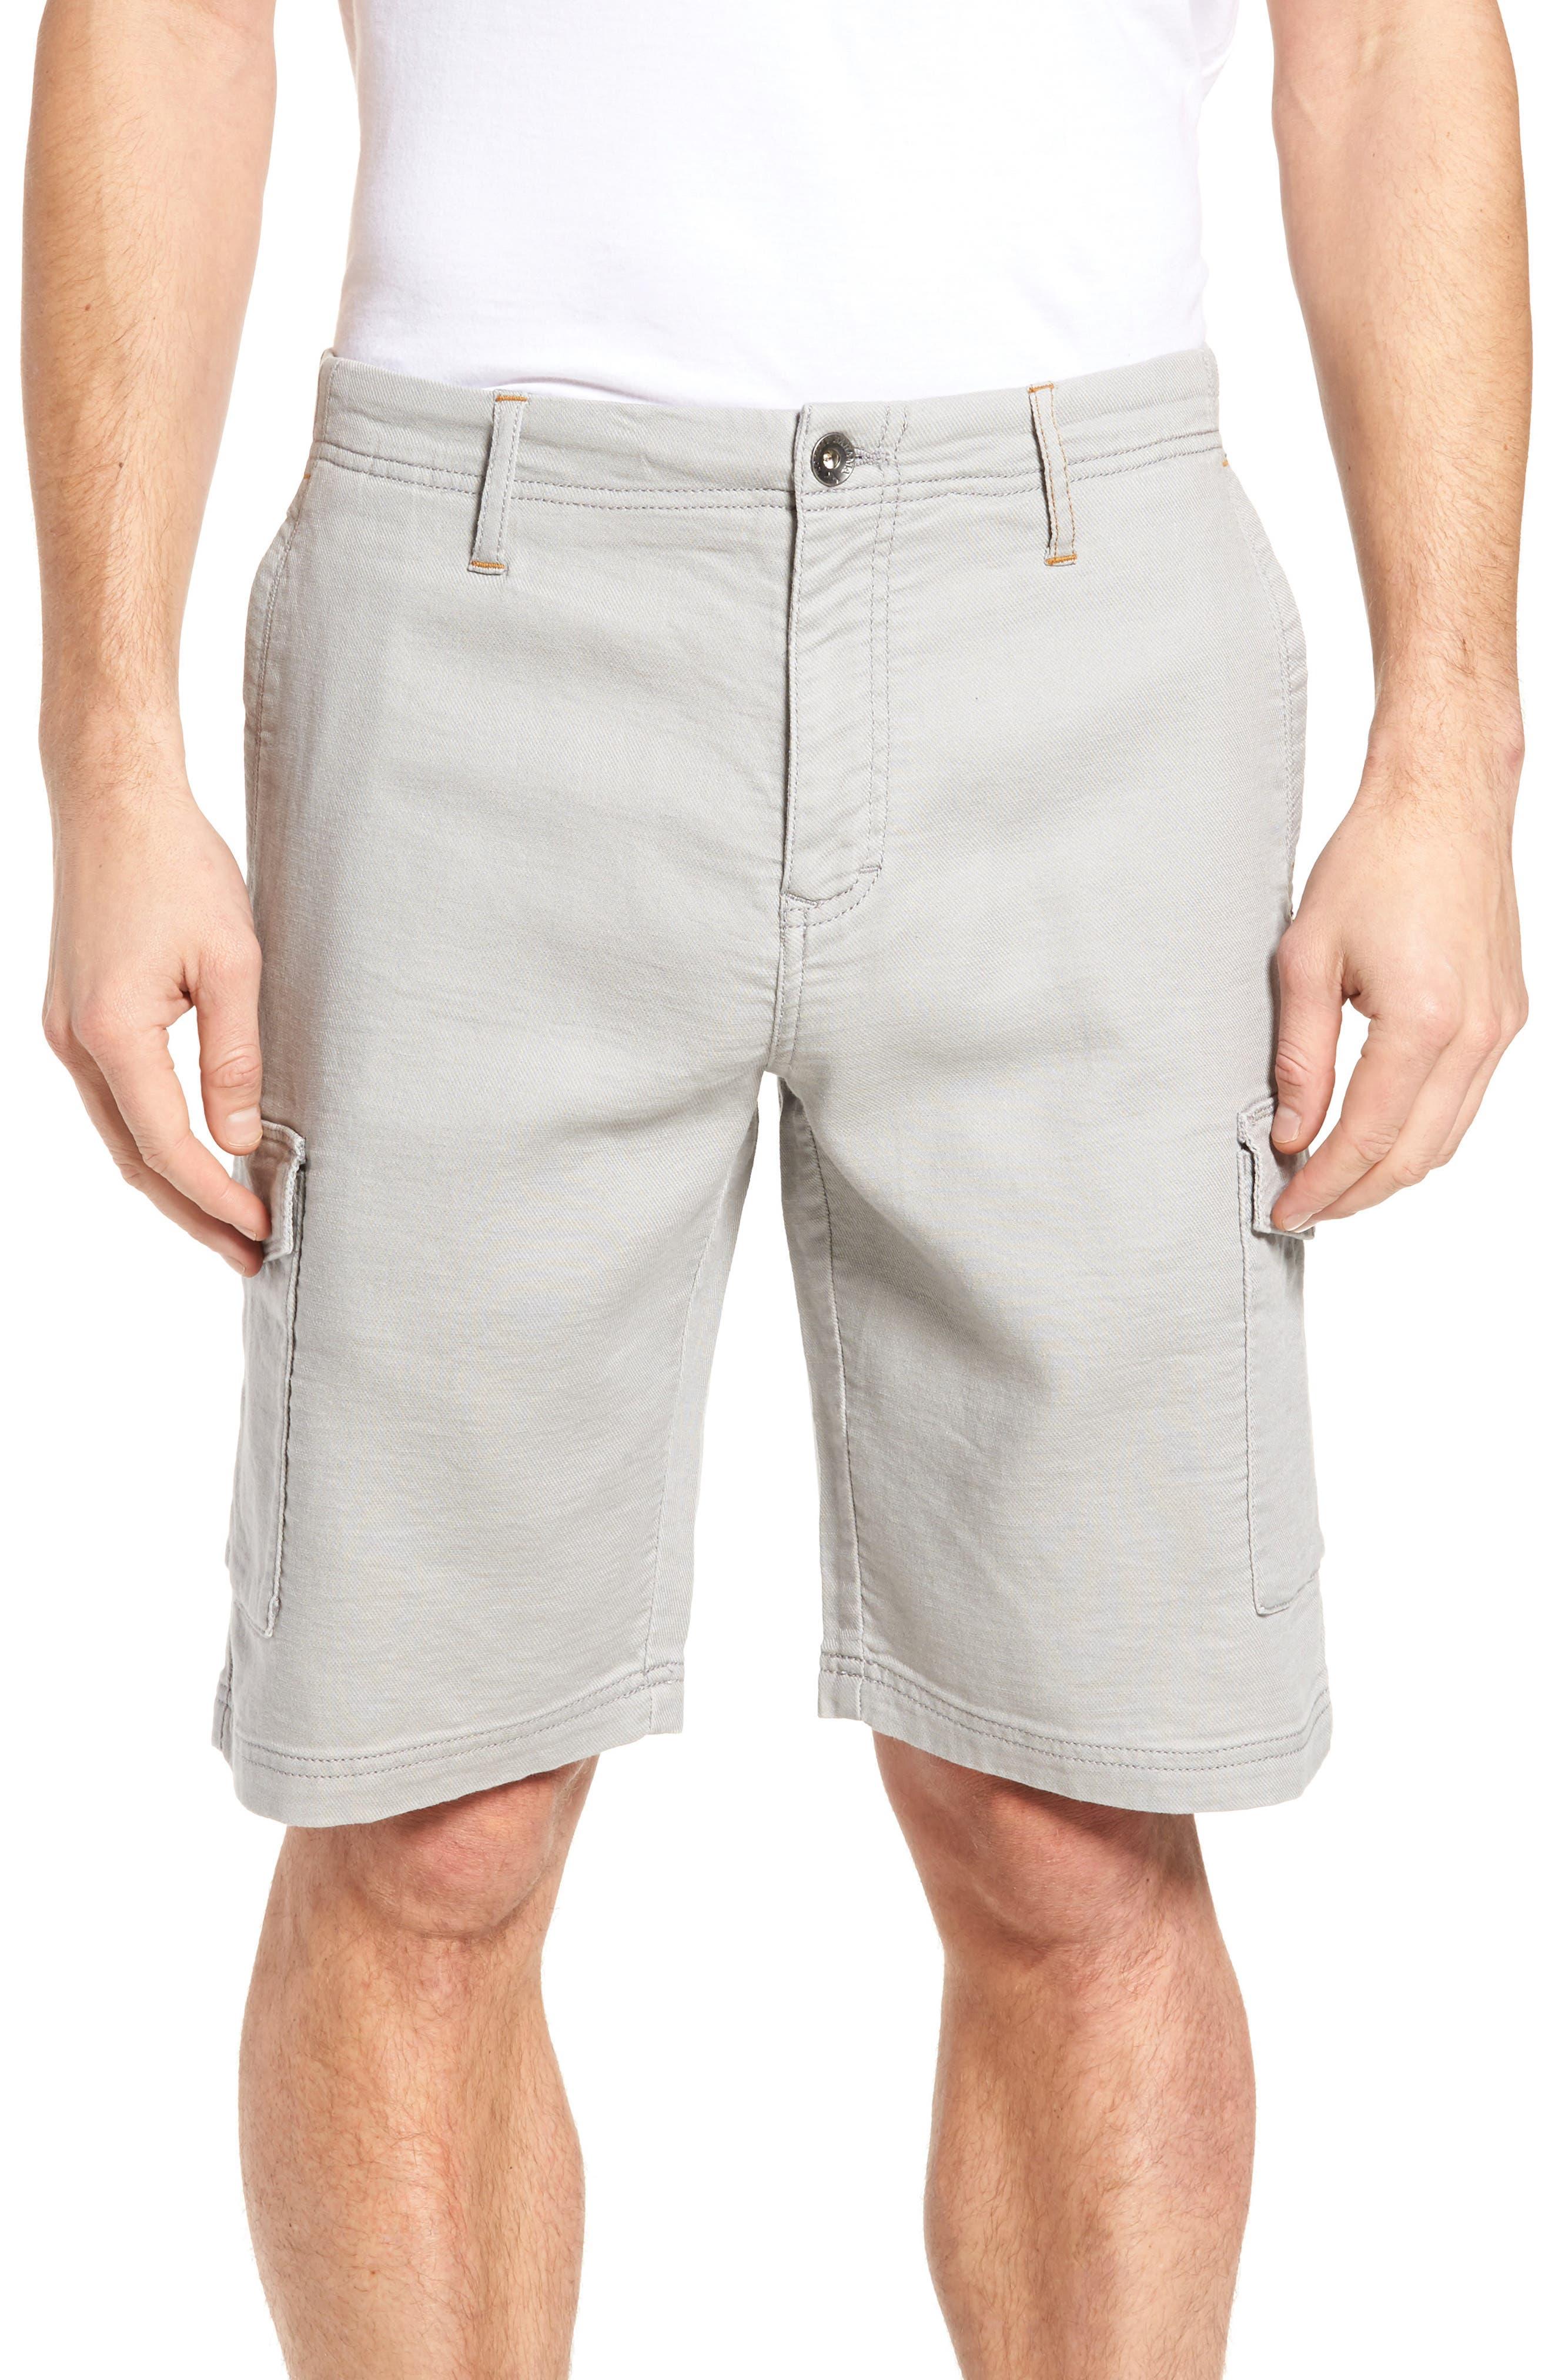 Edgewood Cargo Shorts,                         Main,                         color, Argent